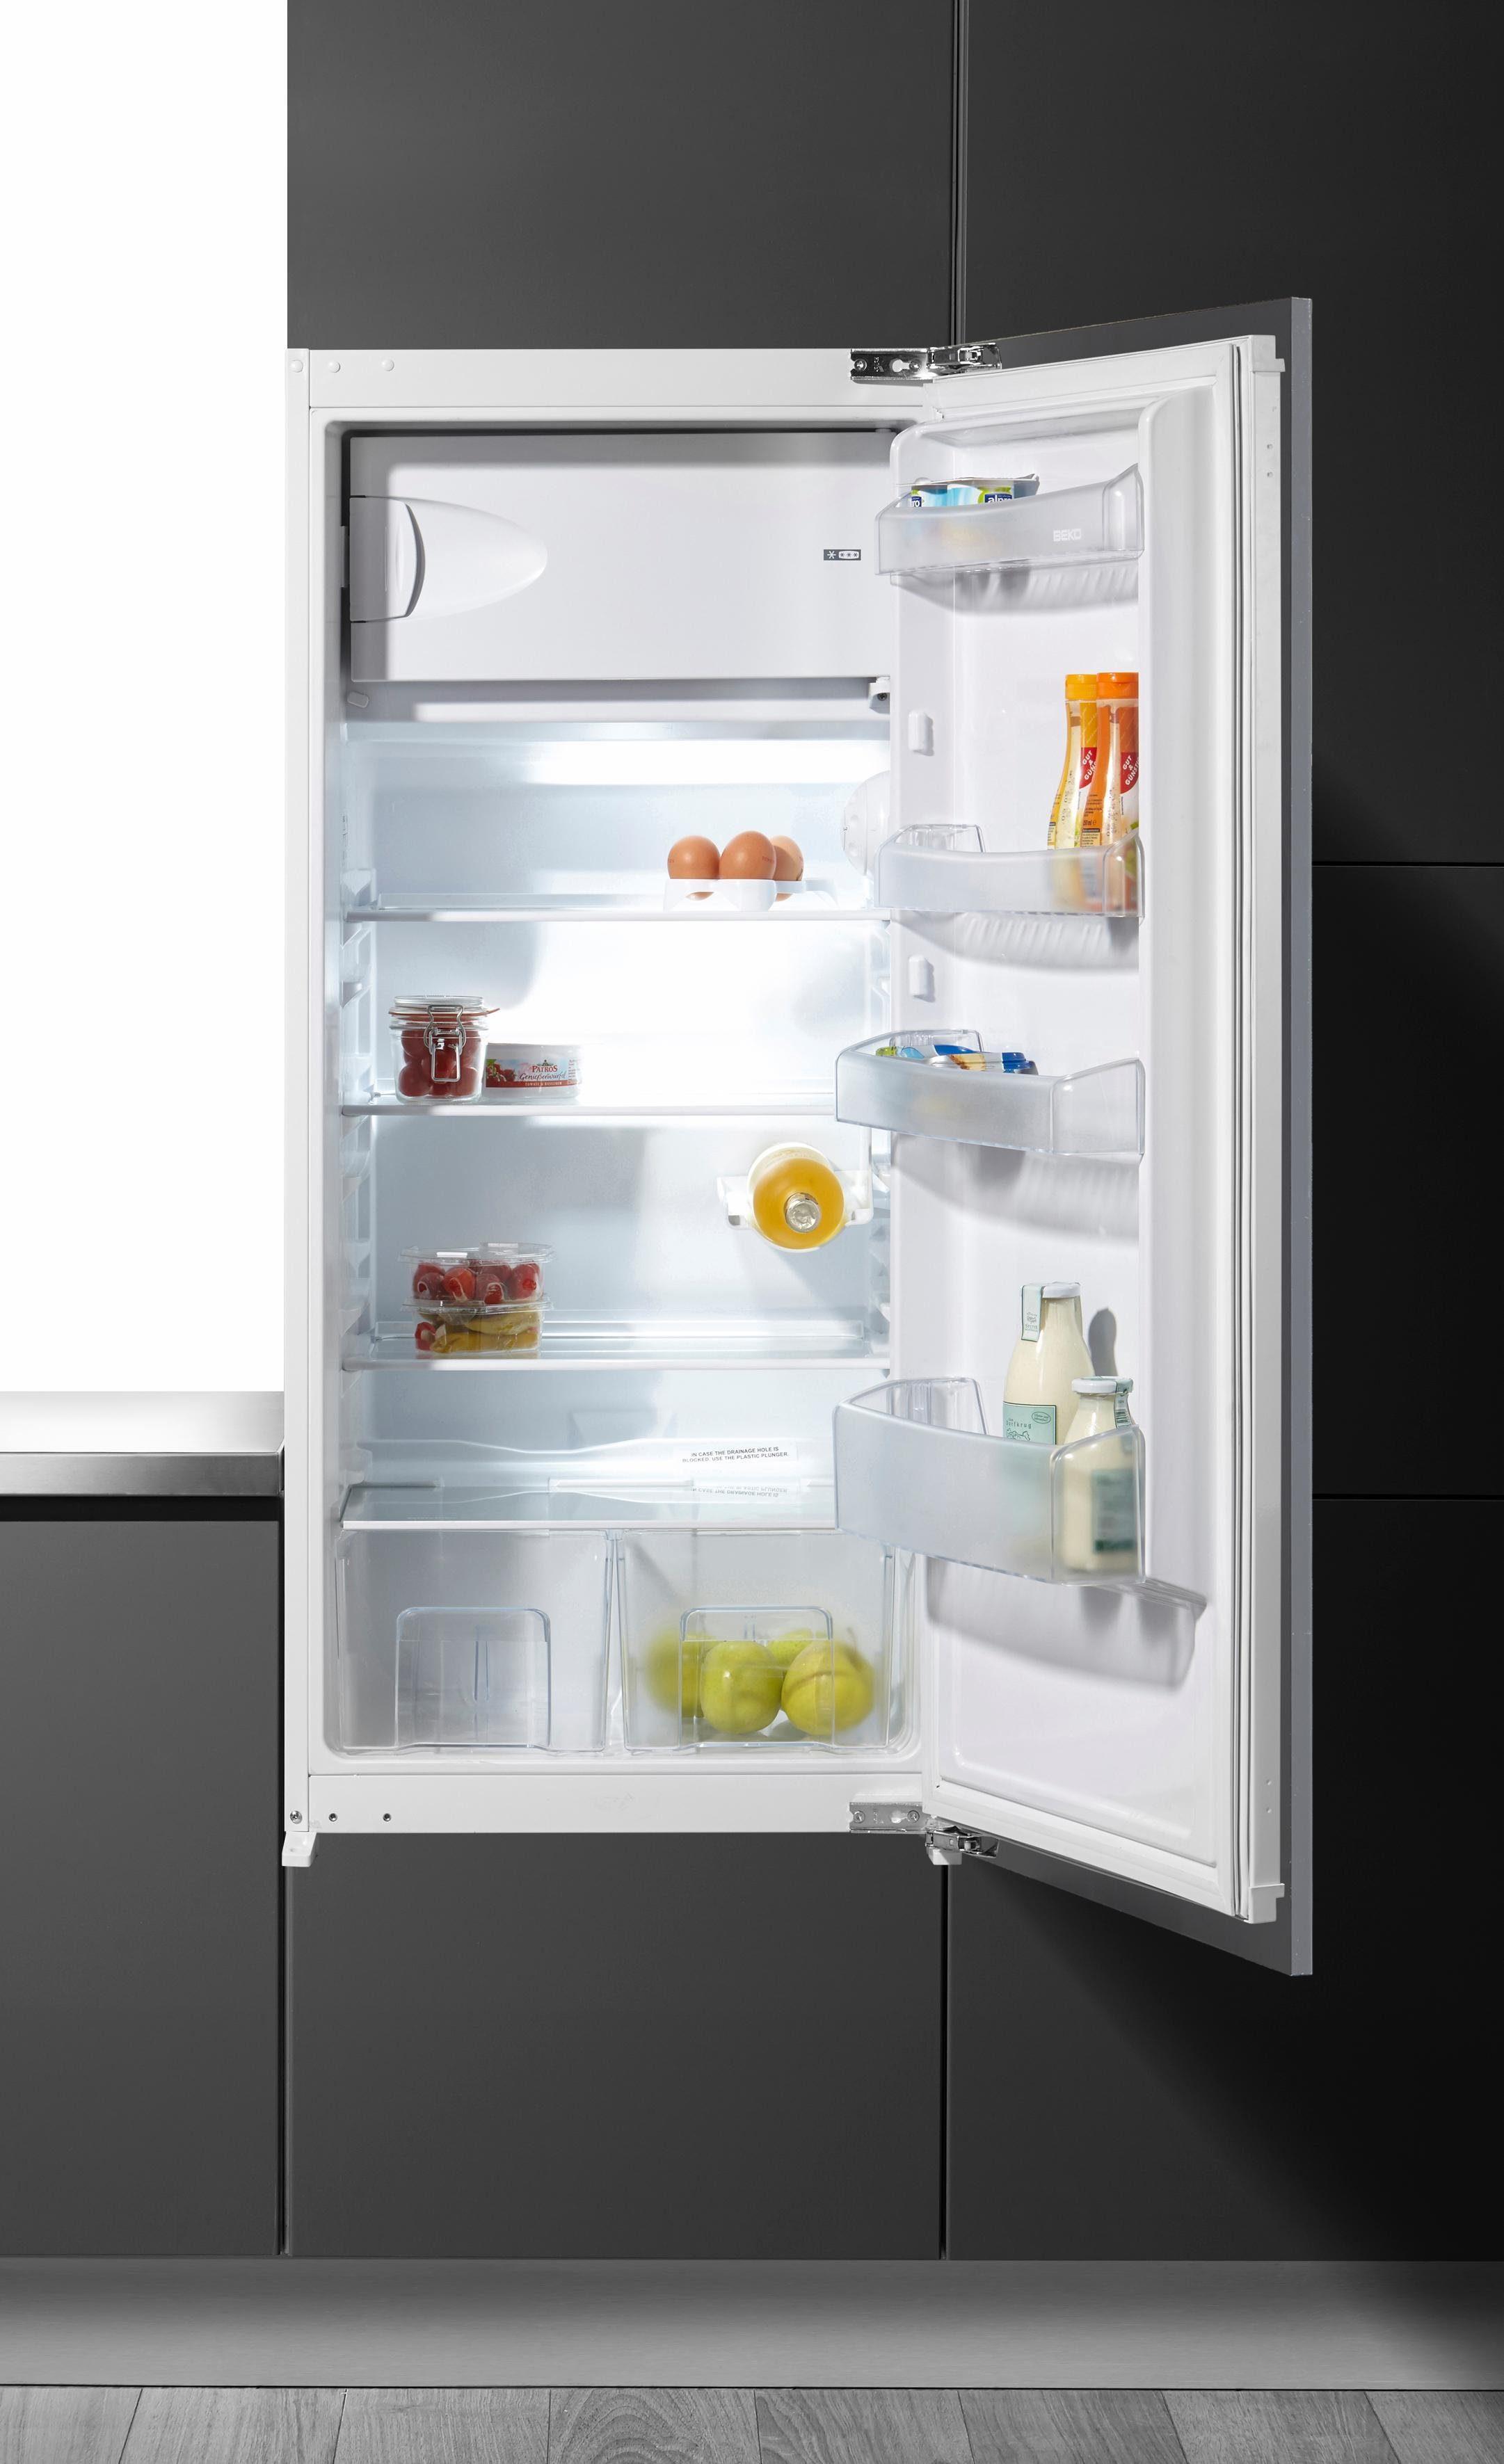 Beko Integrierbarer Einbaukühlschrank RBI 2302 F, A++